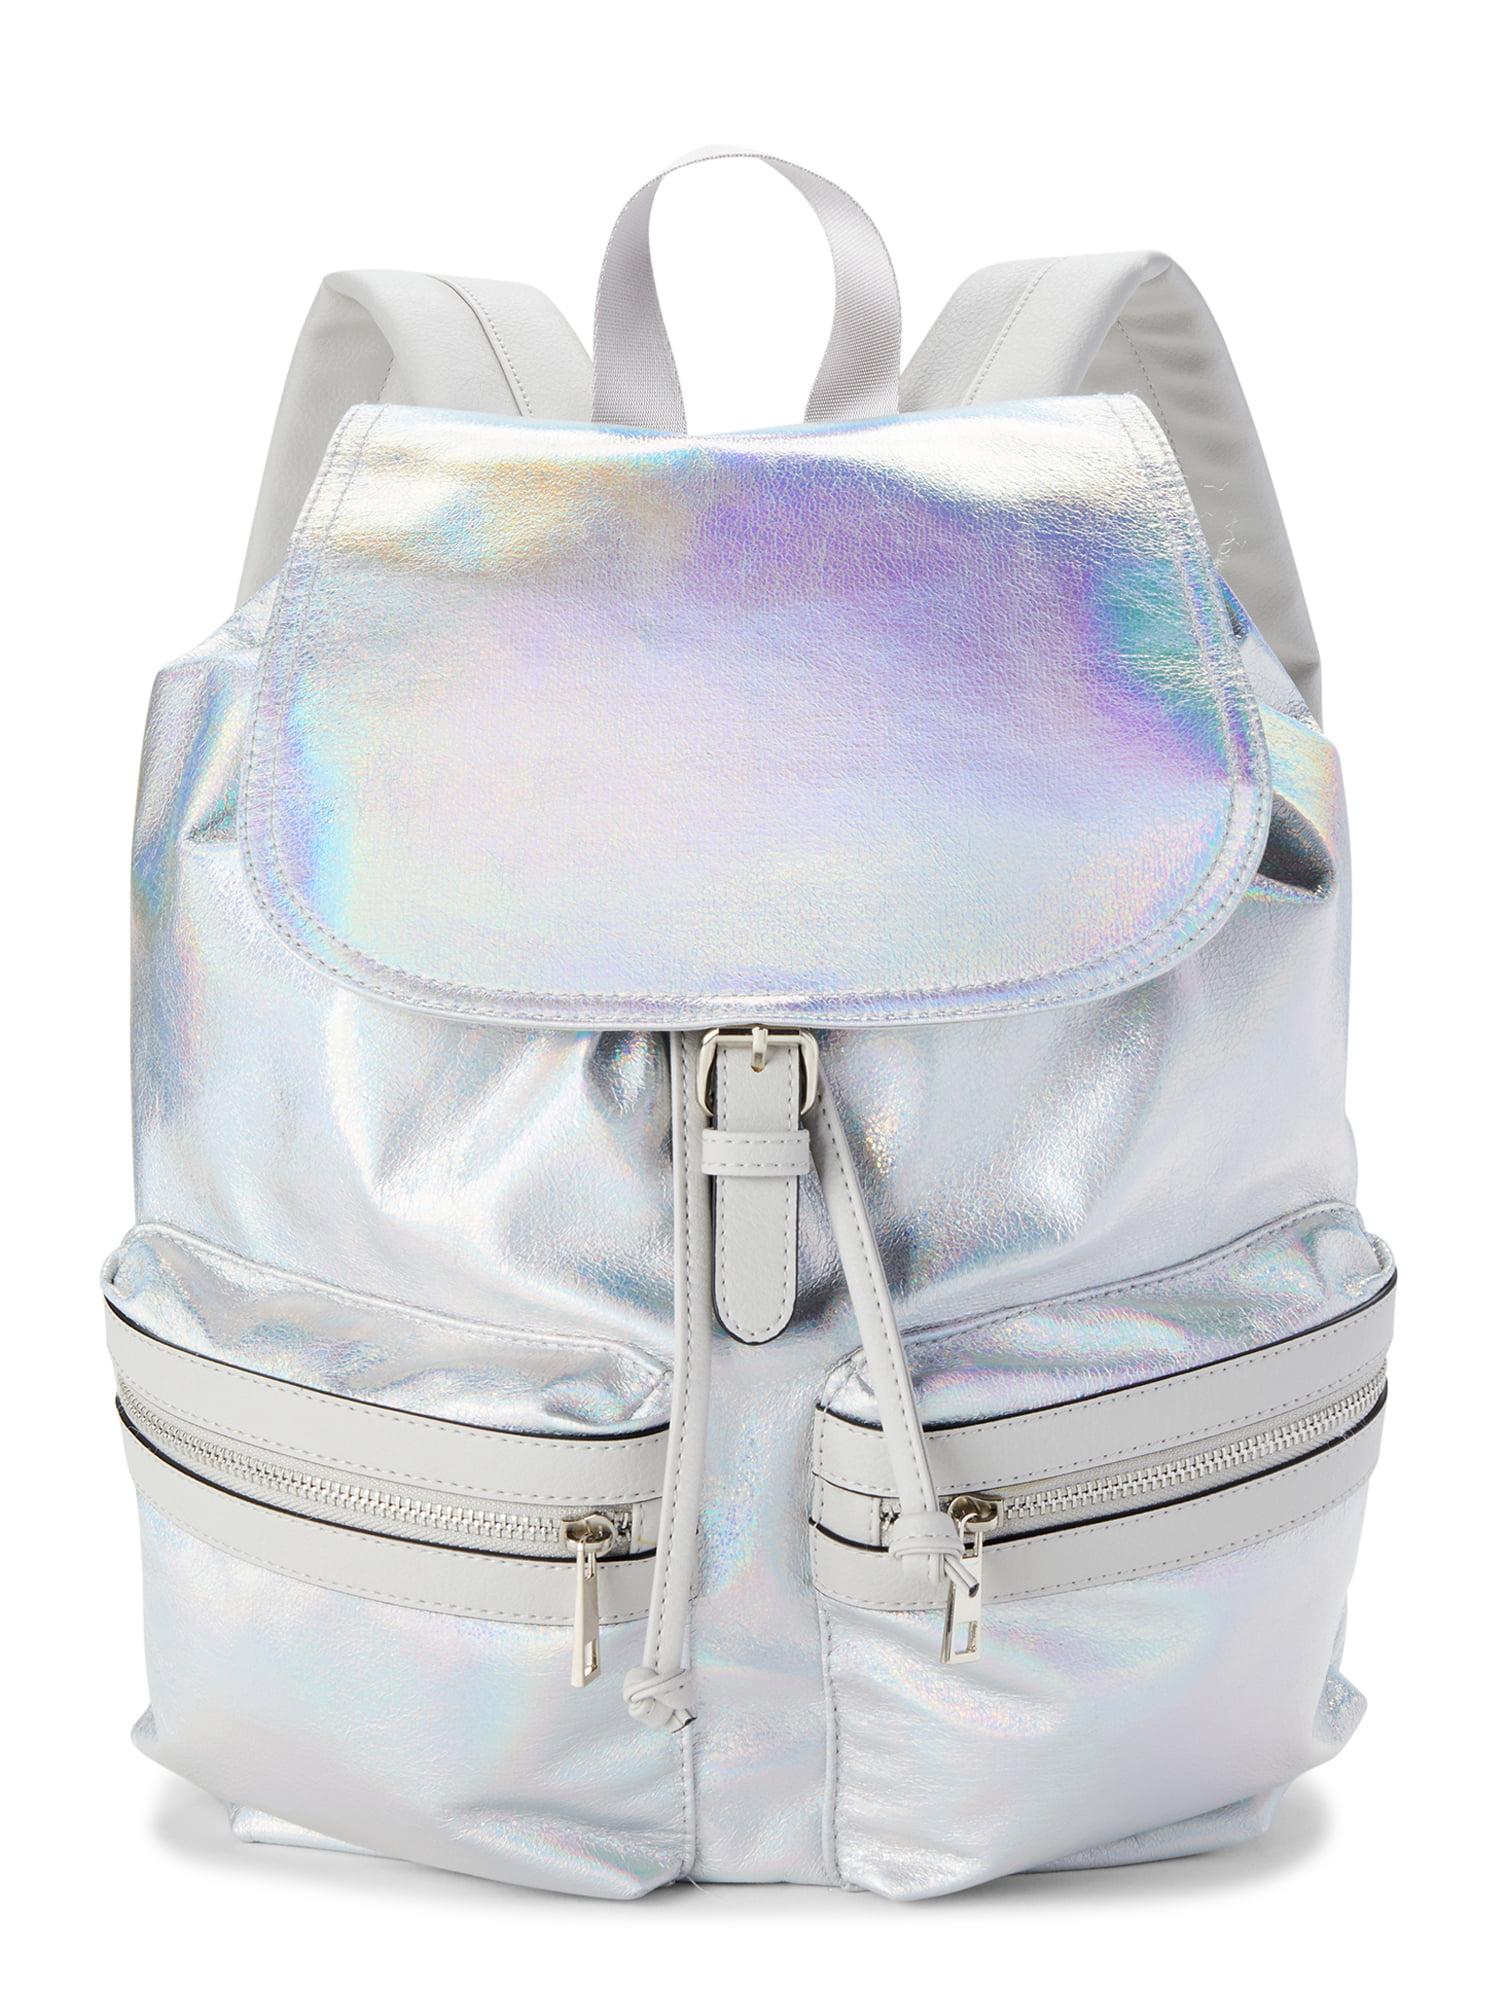 No Boundaries Cargo Backpack, Gray Iridescent